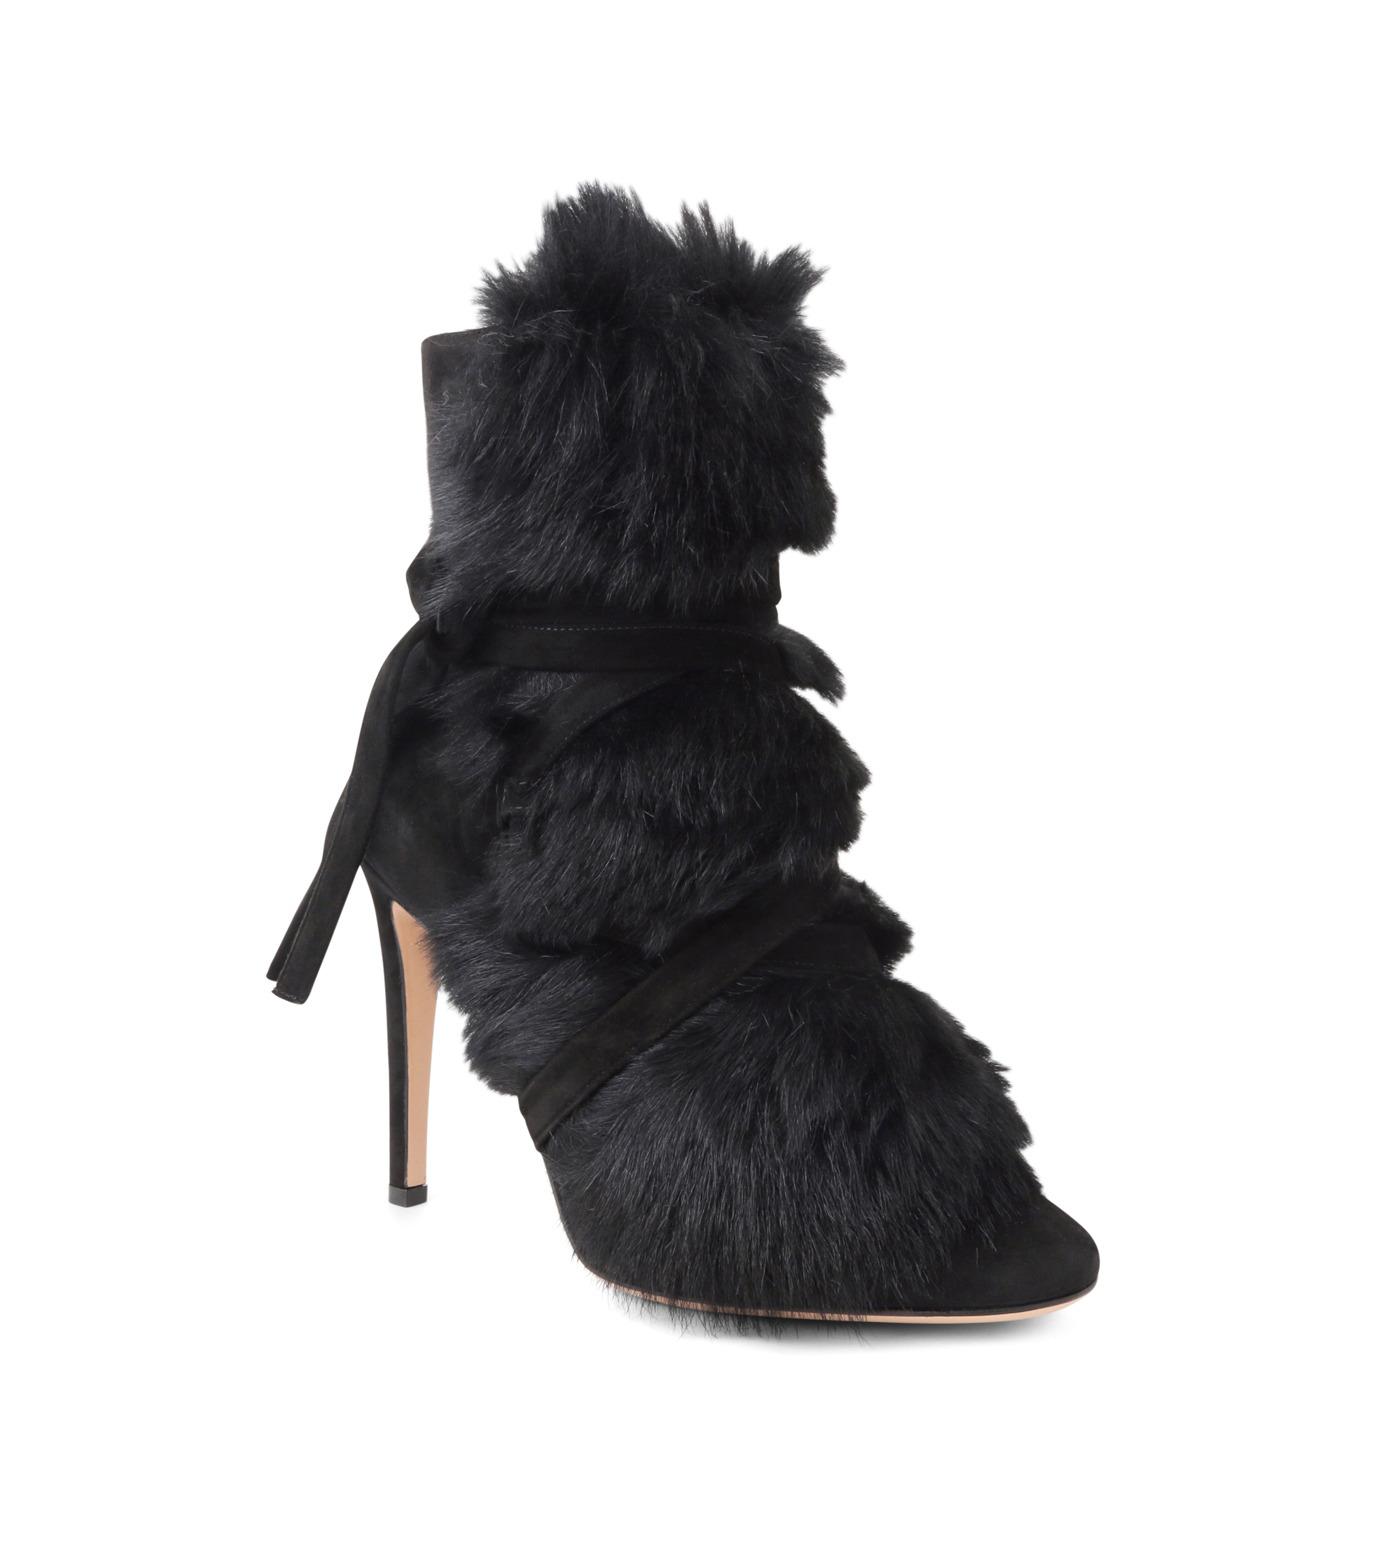 Gianvito Rossi(ジャンヴィト ロッシ)のShort Boots w/Goat Fur-BLACK(ブーツ/boots)-70469-13 拡大詳細画像1